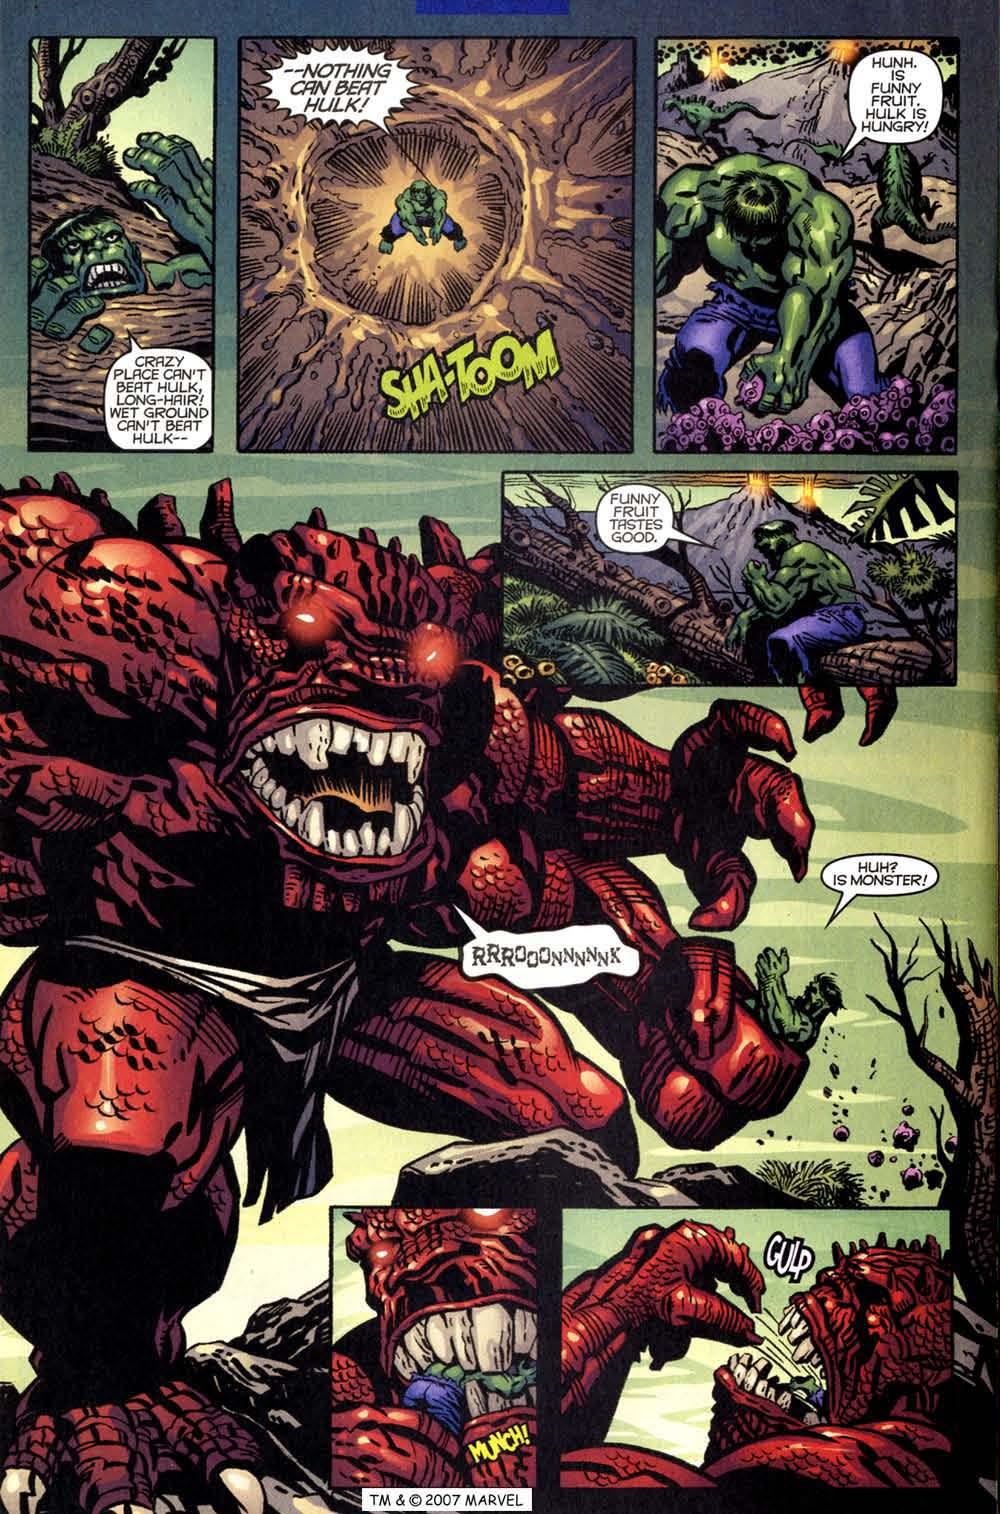 Hulk Fucks She Hulk Cheap thor vs hulk tally up. - take five forums